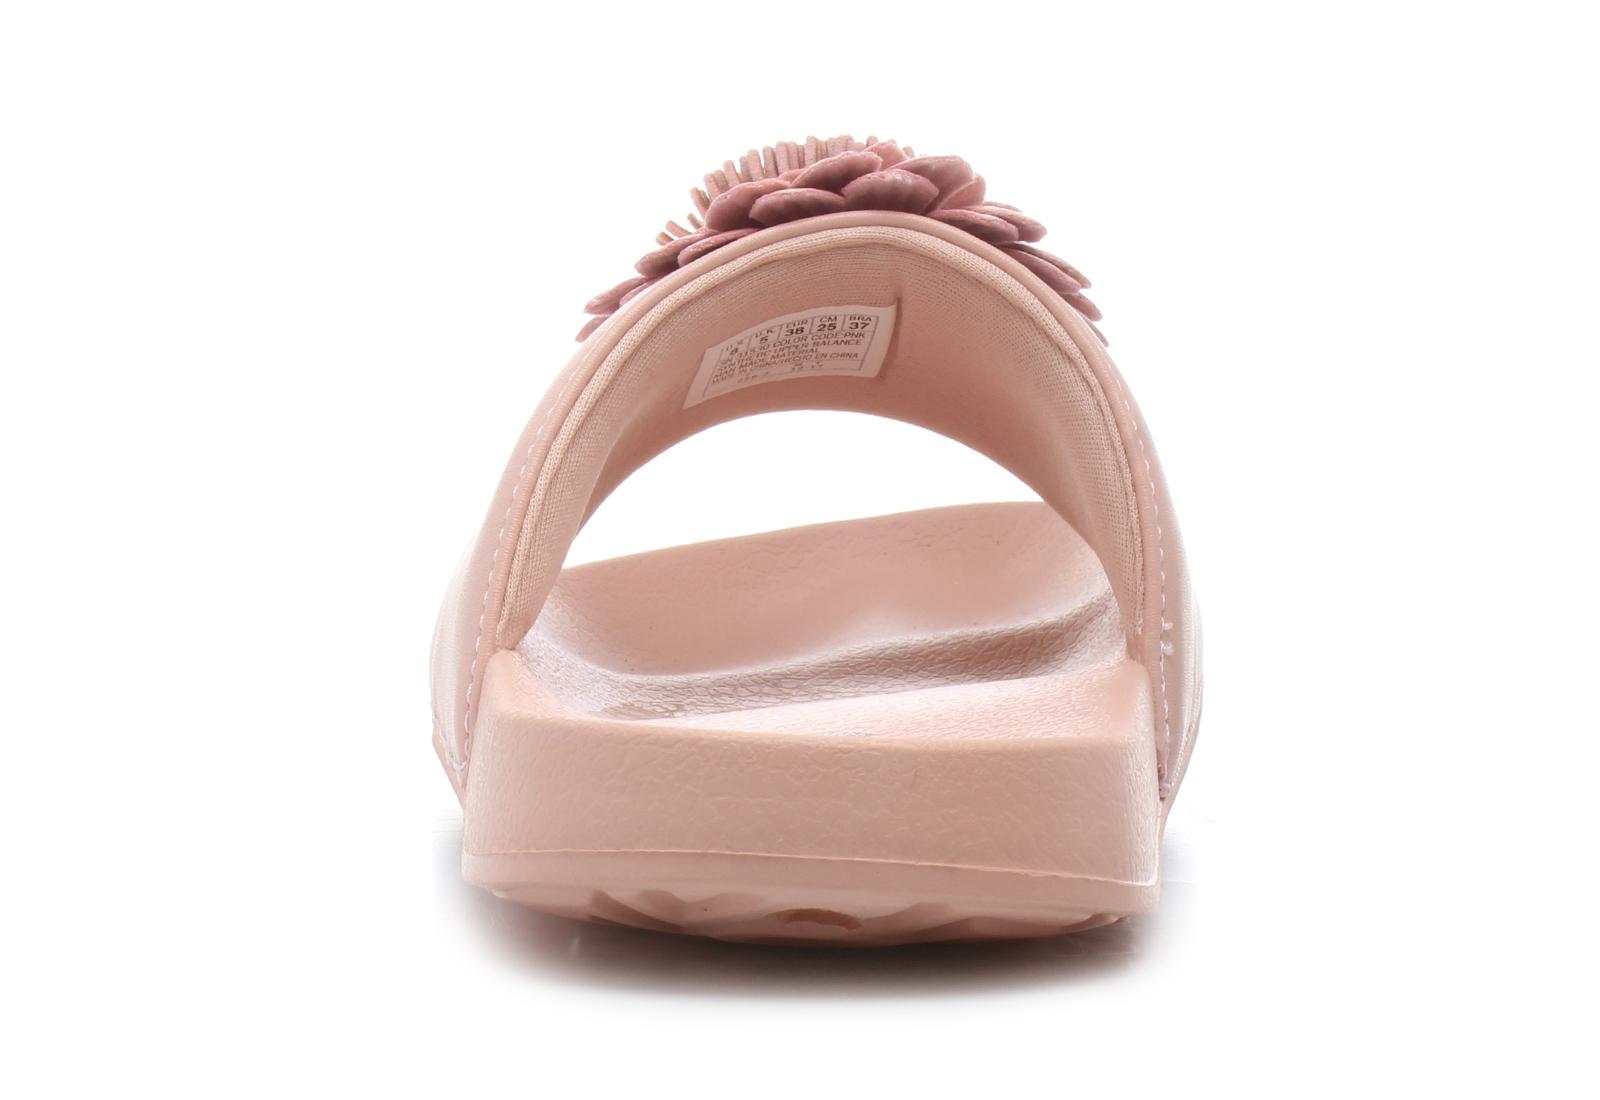 f22458d62bd7 Skechers Slippers - 2nd Take - Metal Petal - 31530-pnk - Online shop ...